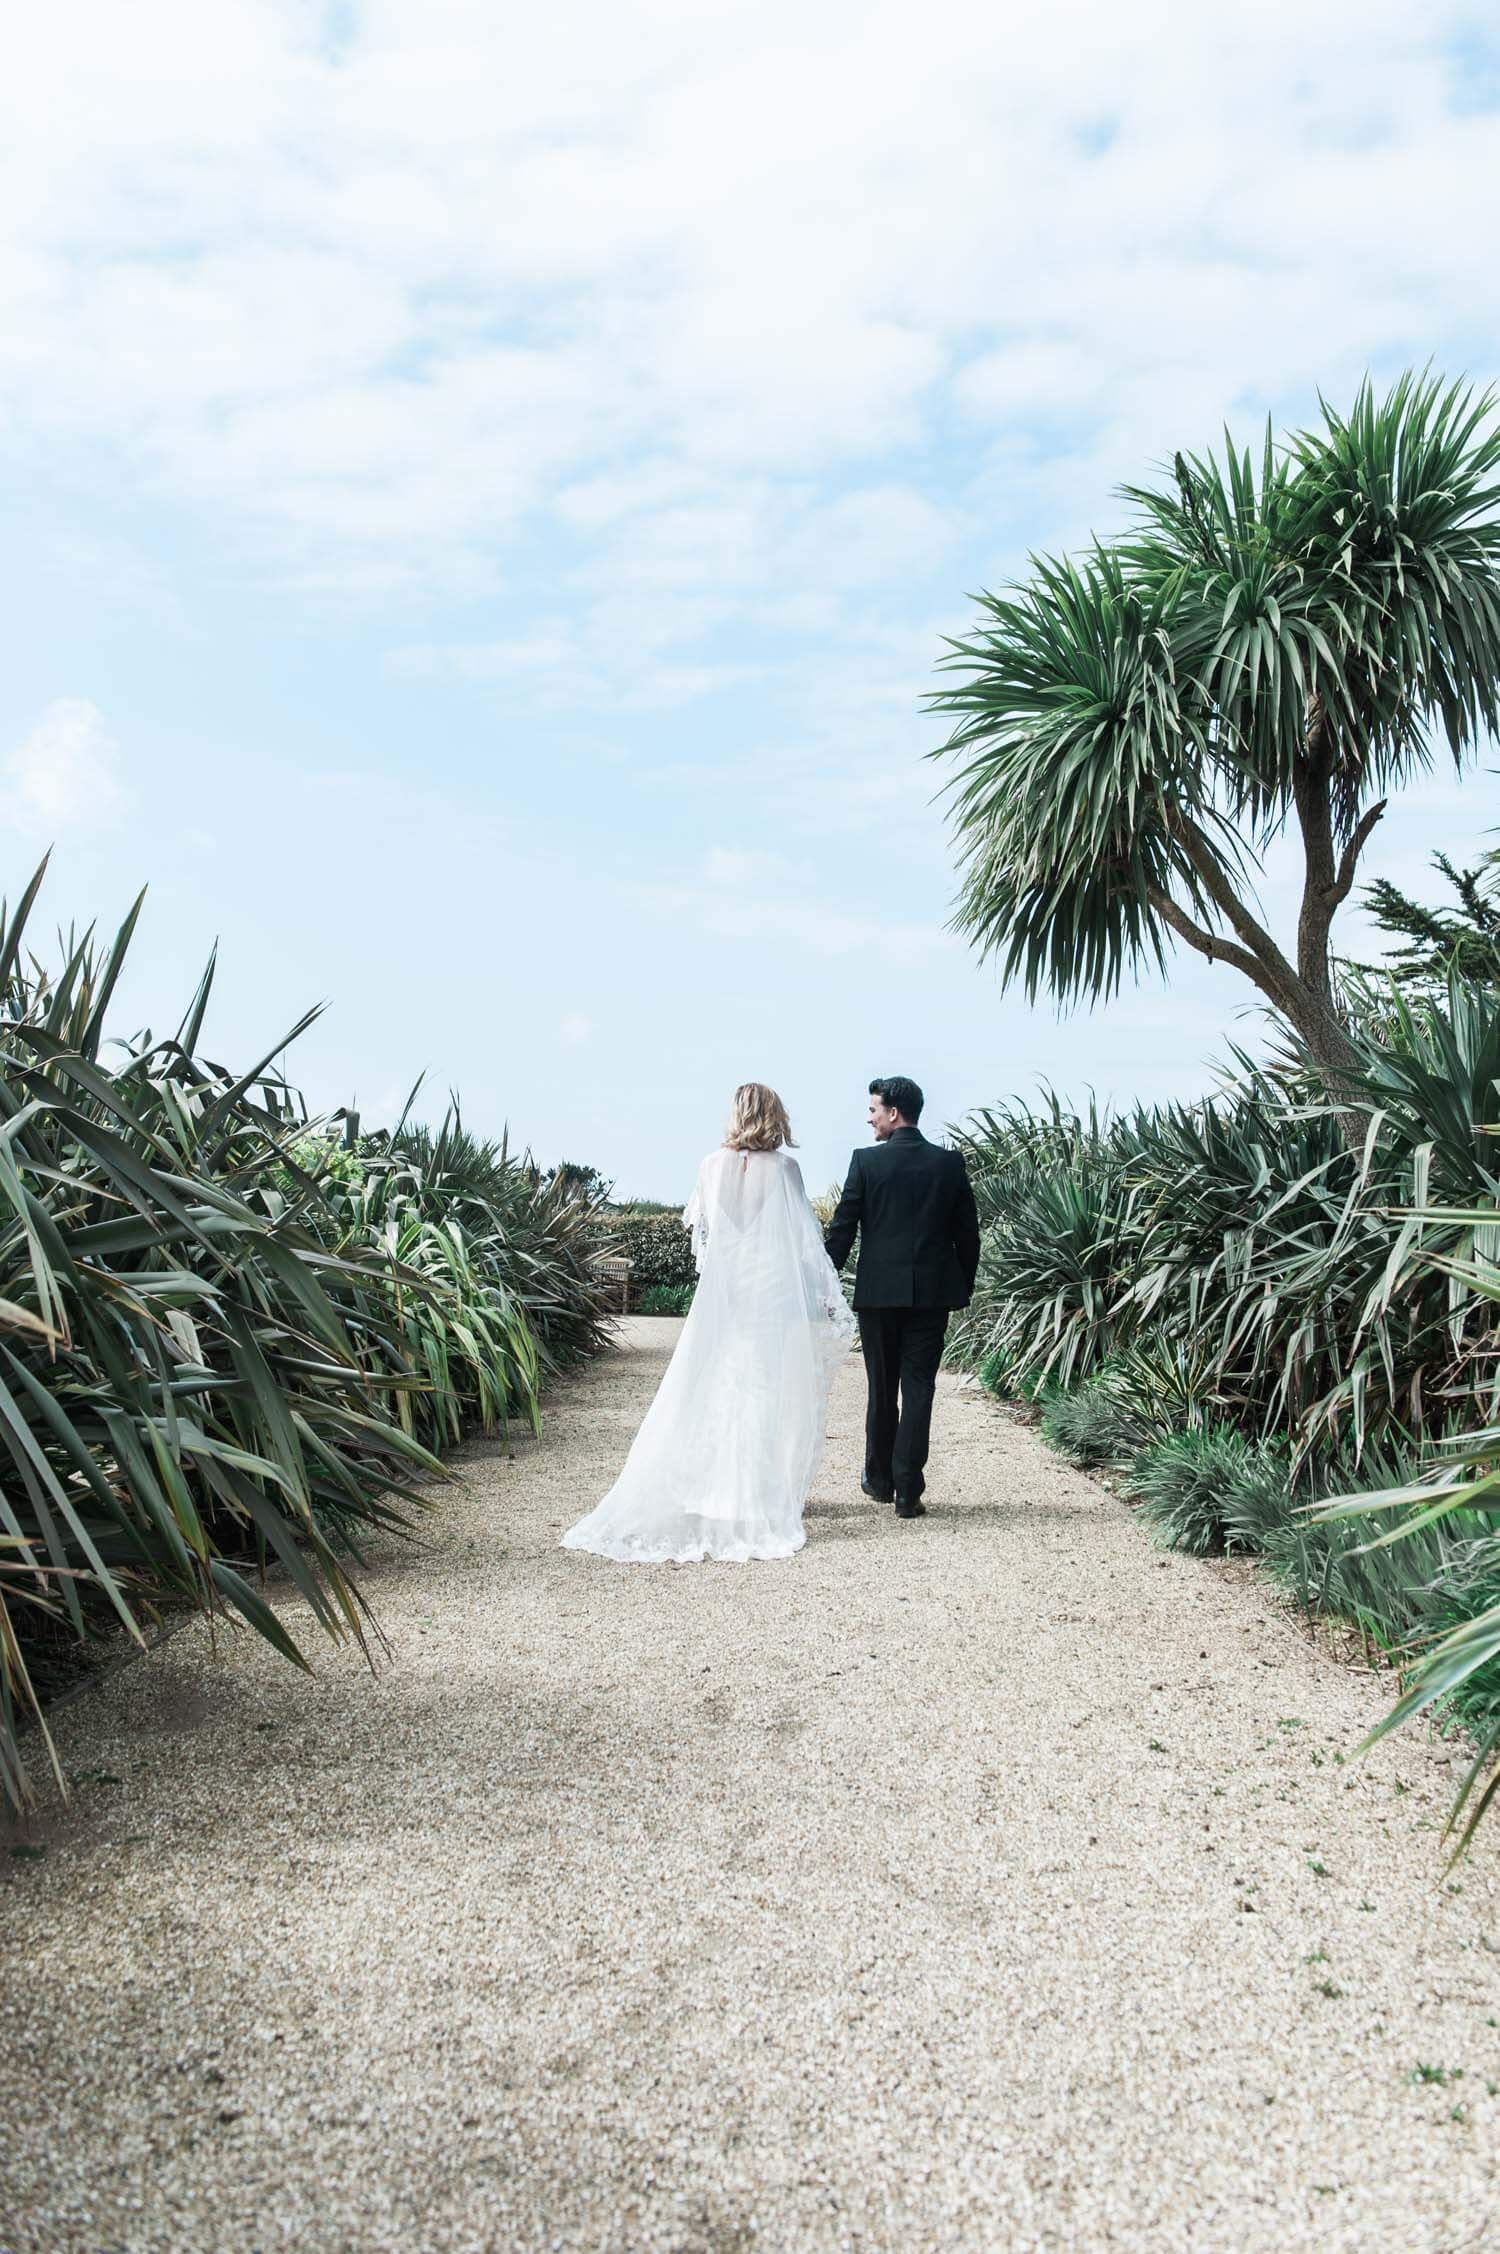 European destination wedding photographer - Wit Photography - London wedding photographer, Greece wedding photographer, Paris wedding photogrpher, Italy wedding photographer-23